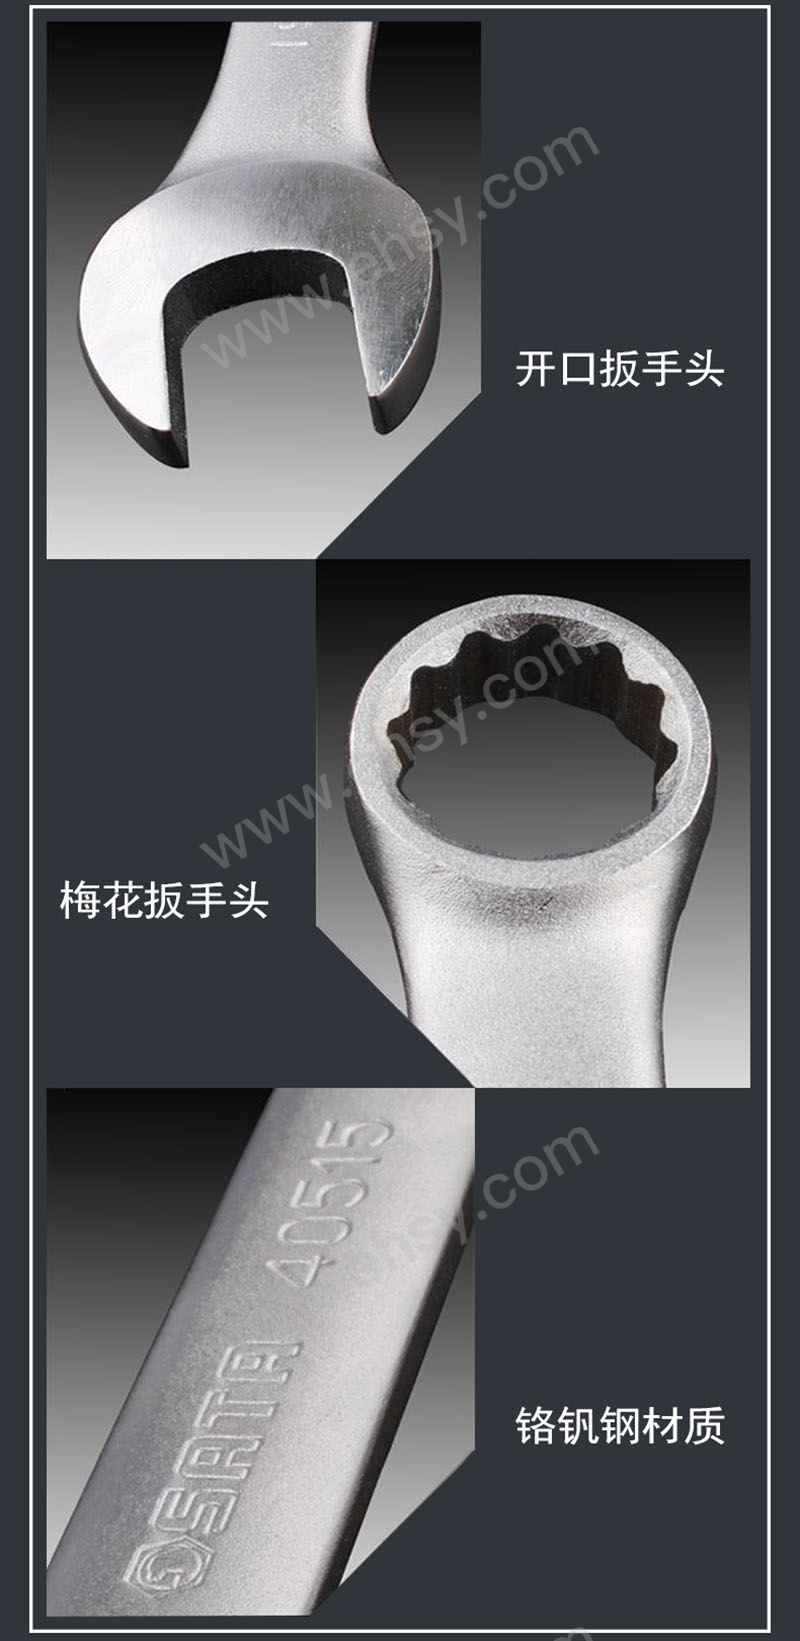 RHY906产品细节.jpg